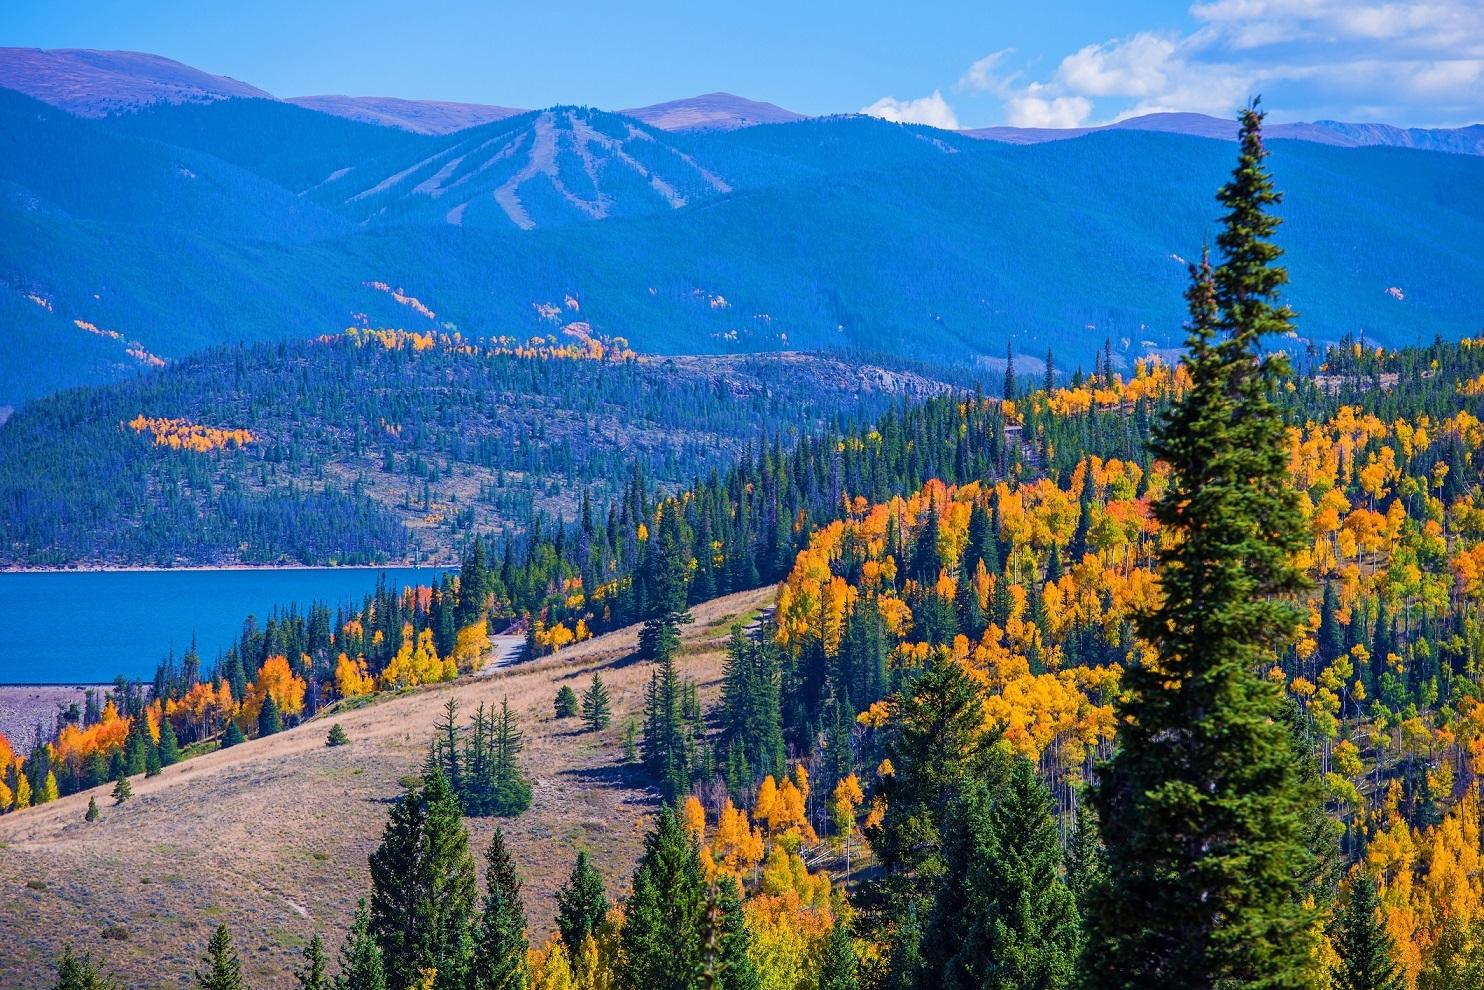 Coloardo mountain scenery